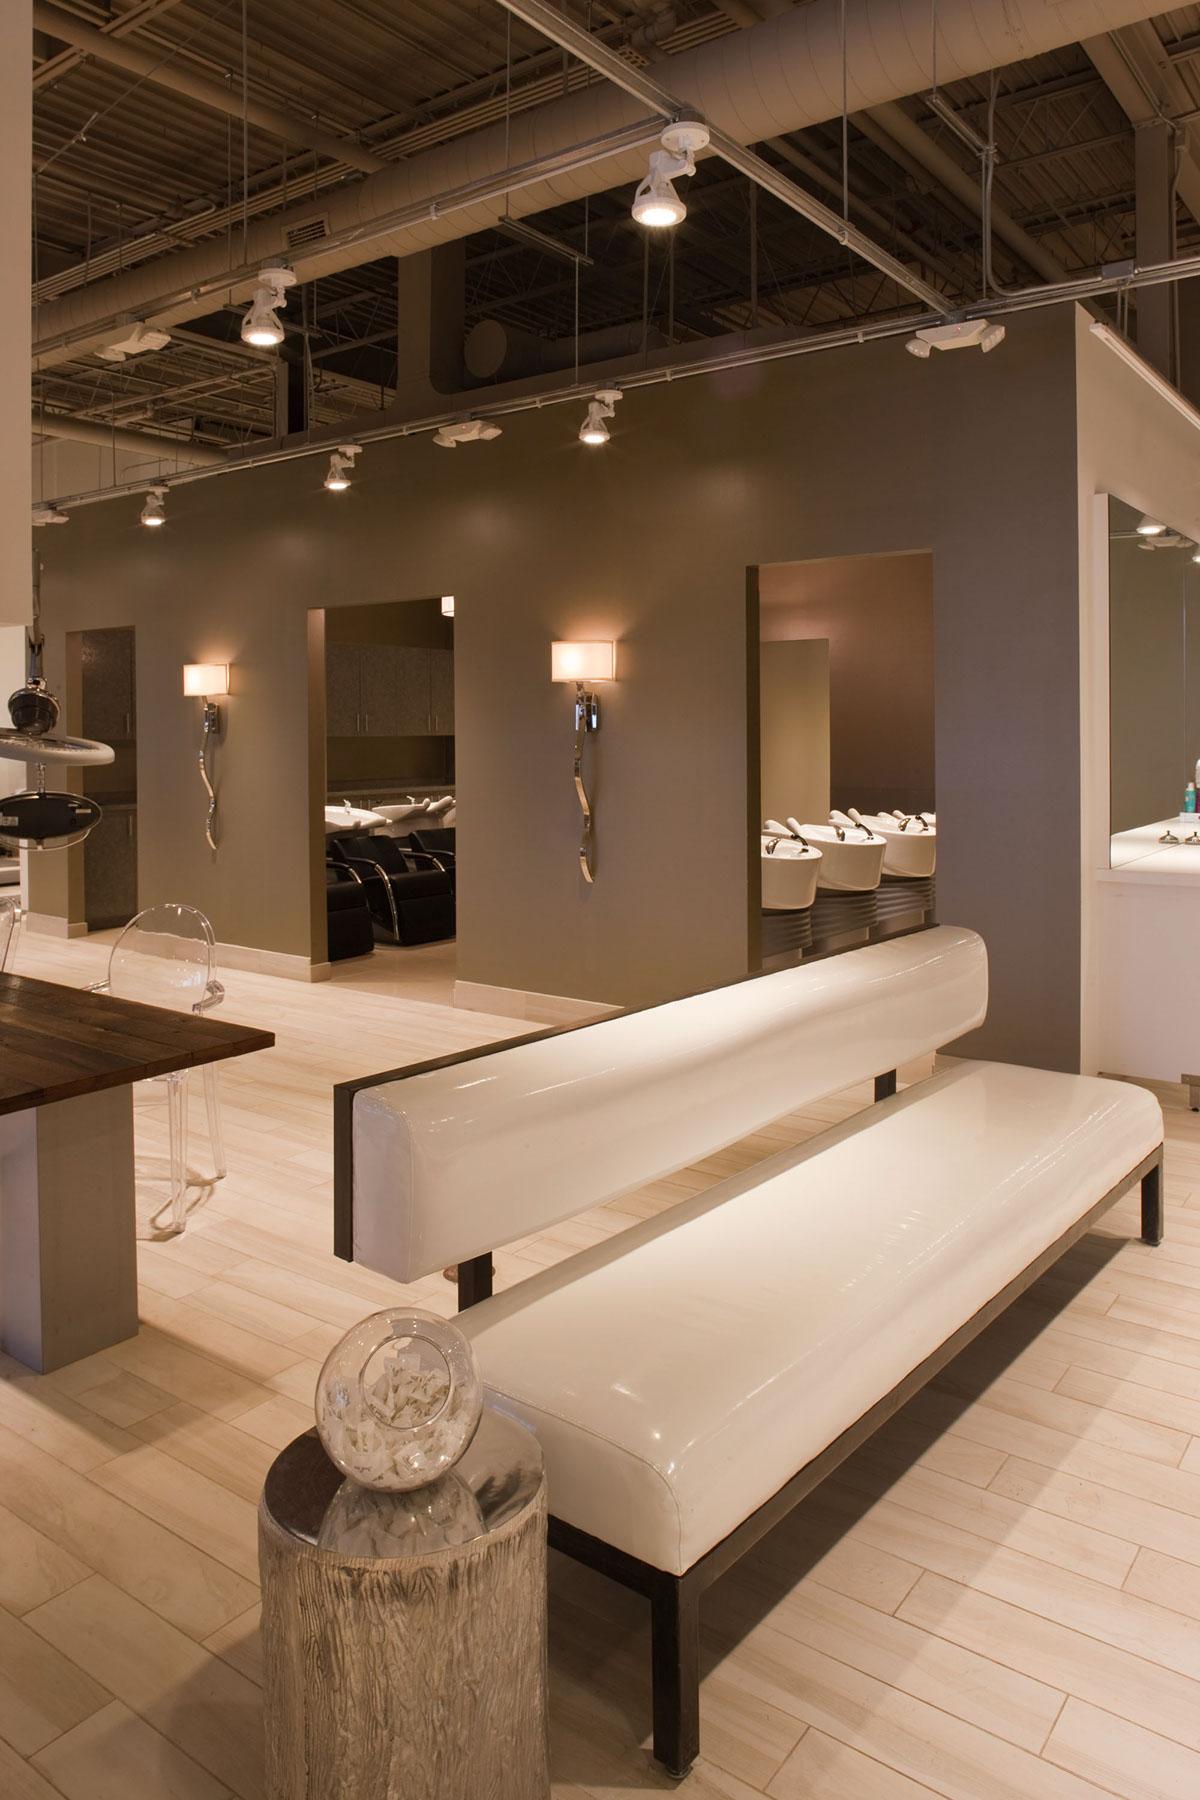 Interior design award winning tricho leslie mcgwire on for Interior lighting design